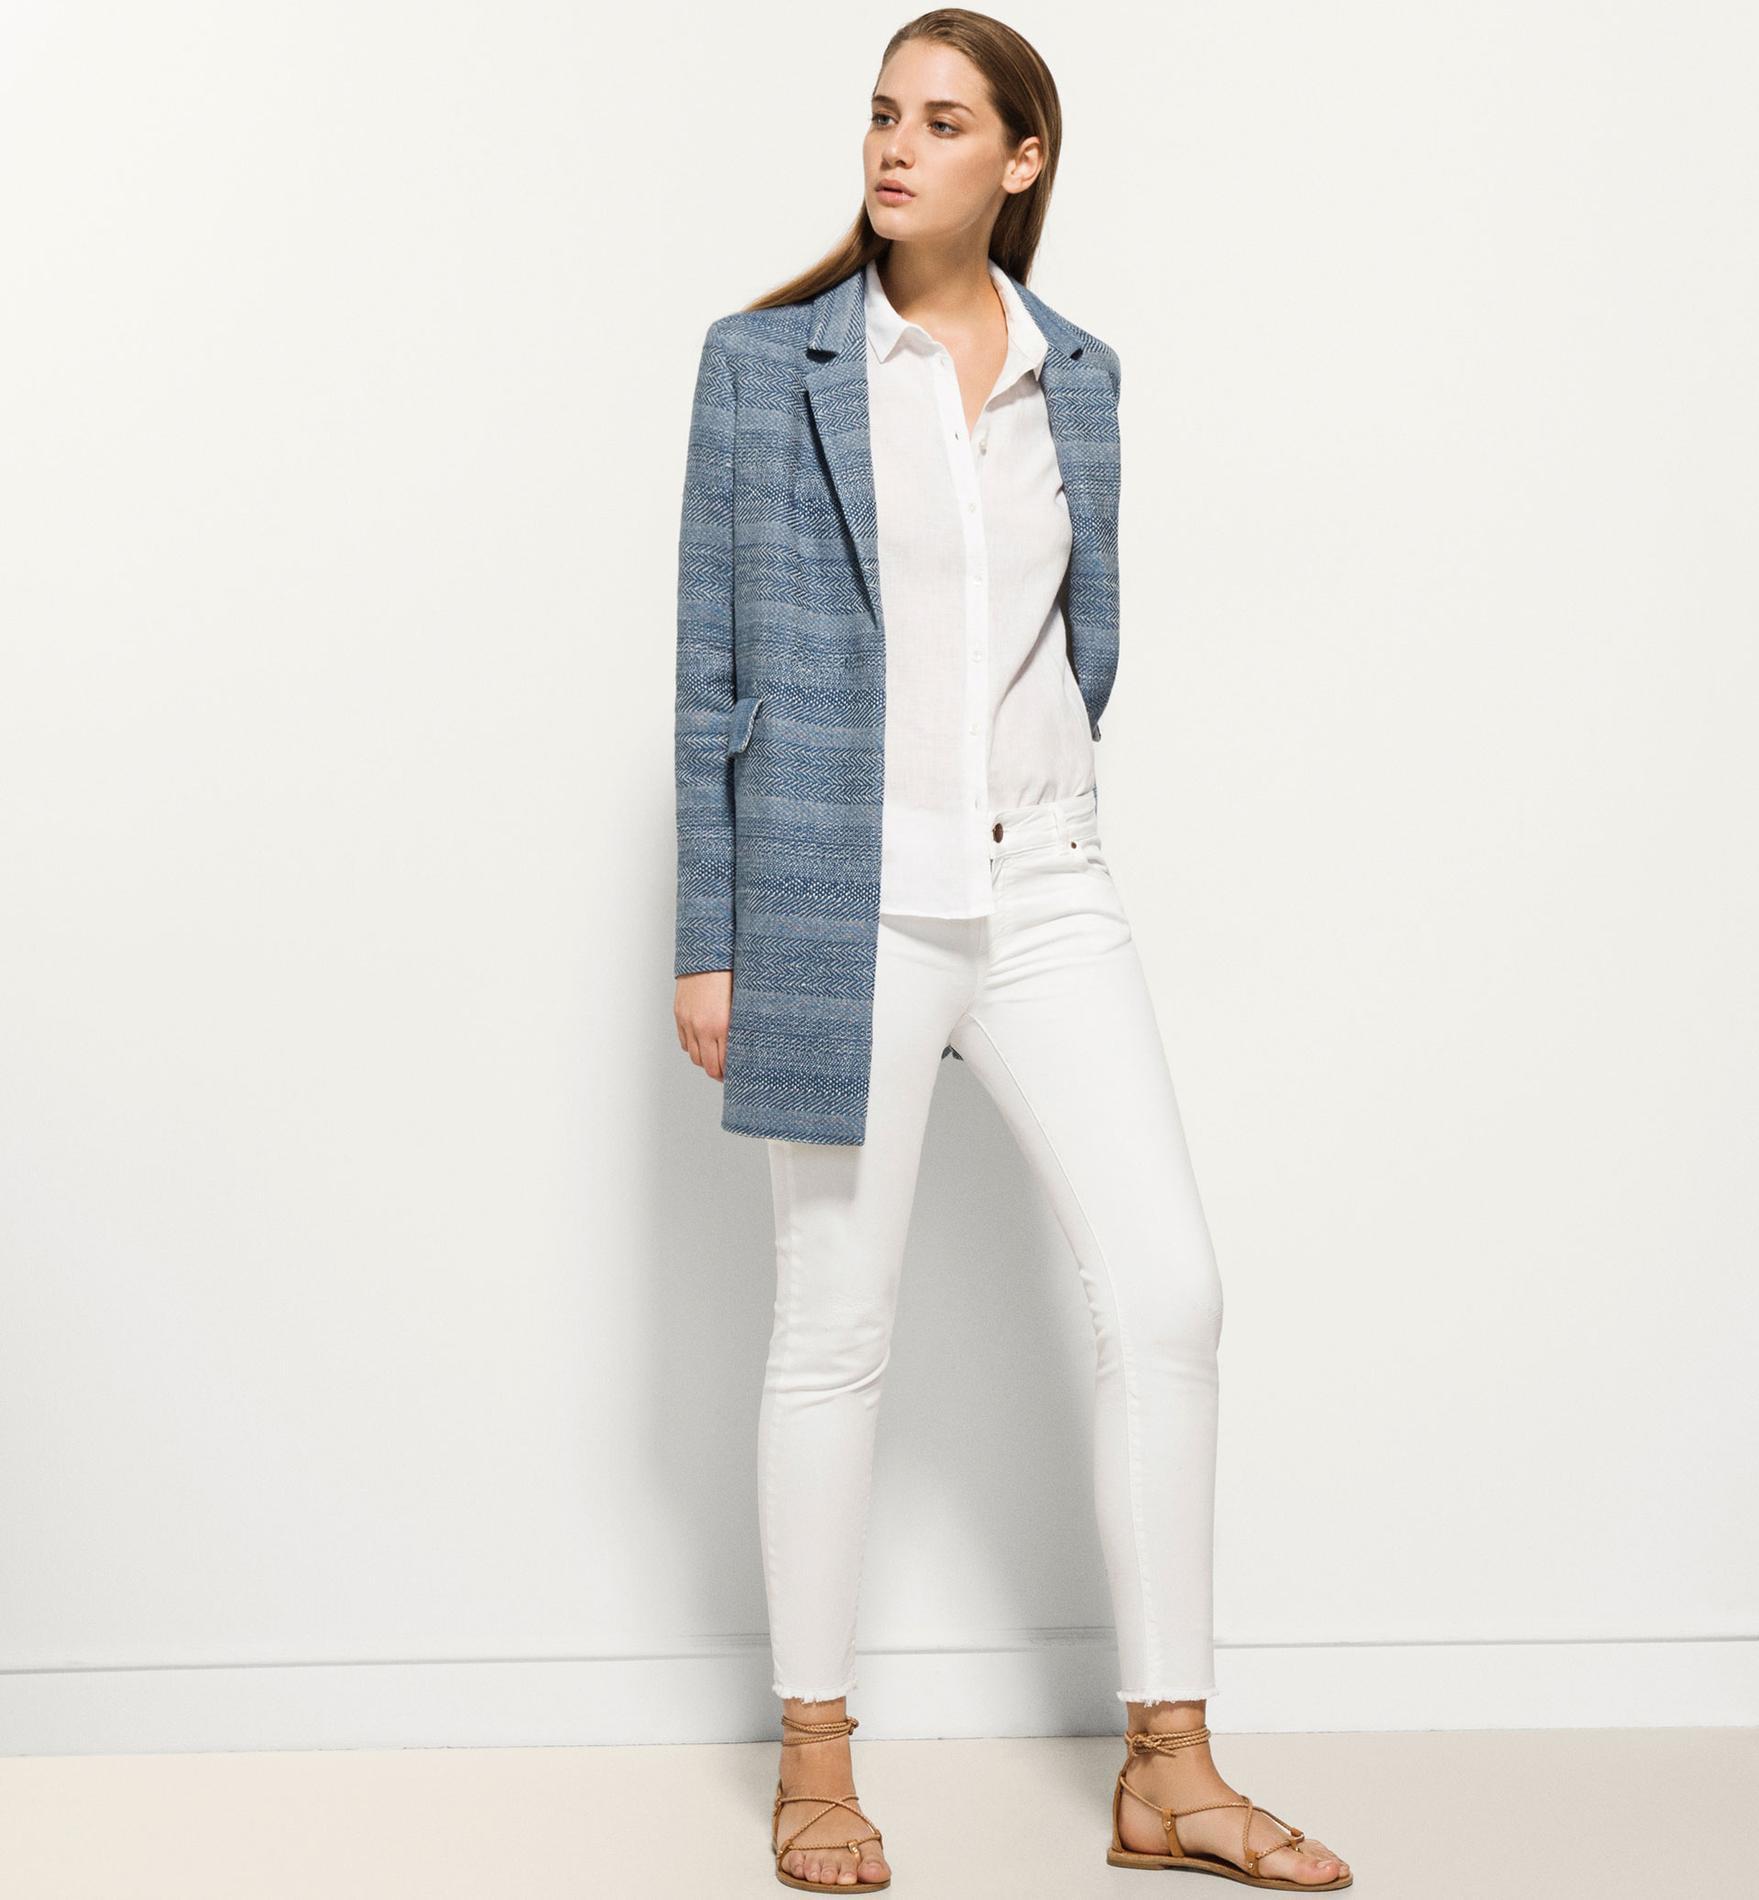 9495361da1516 Comment porter le pantalon blanc ? - Madame Figaro